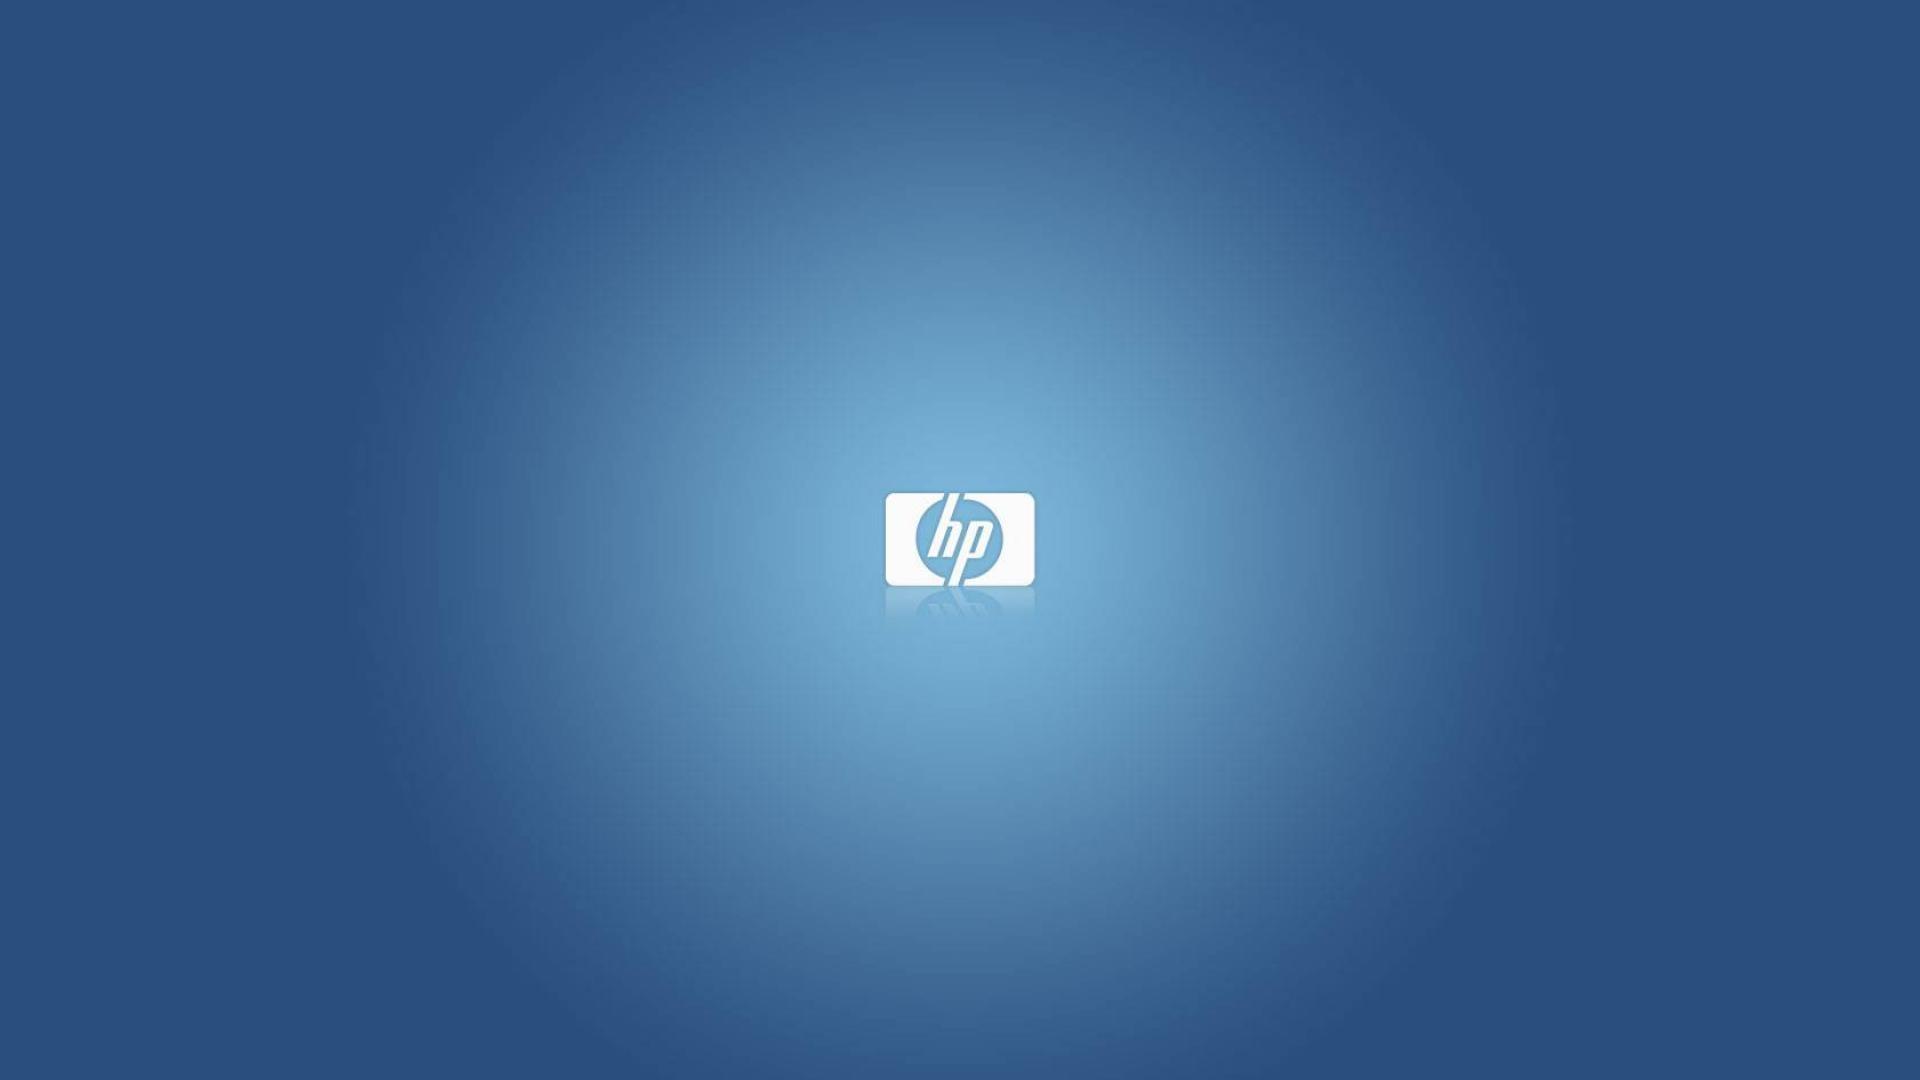 Res: 1920x1080, hp pavilion wallpapers widescreen HP Widescreen Wallpaper 1920x1200